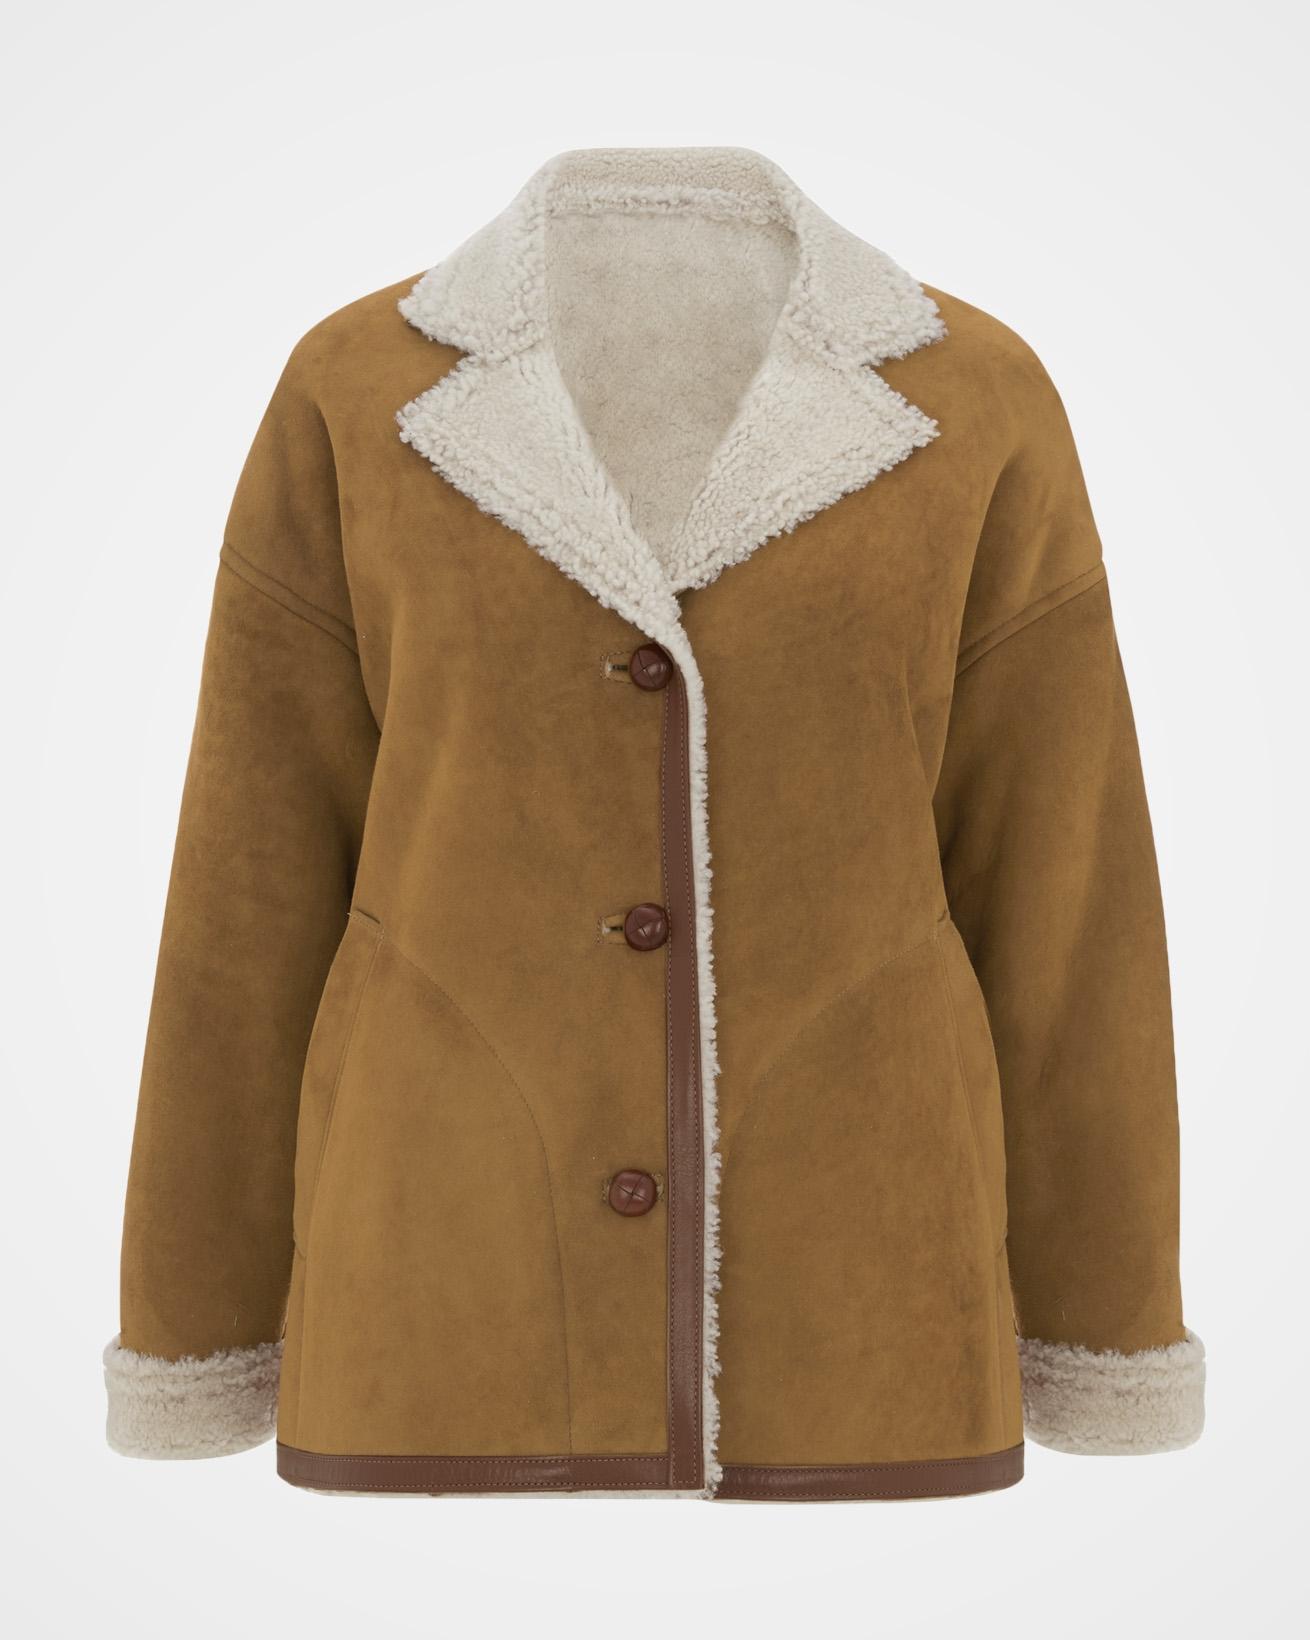 7065_classic_sheepskin_jacket_front_aw20.jpg